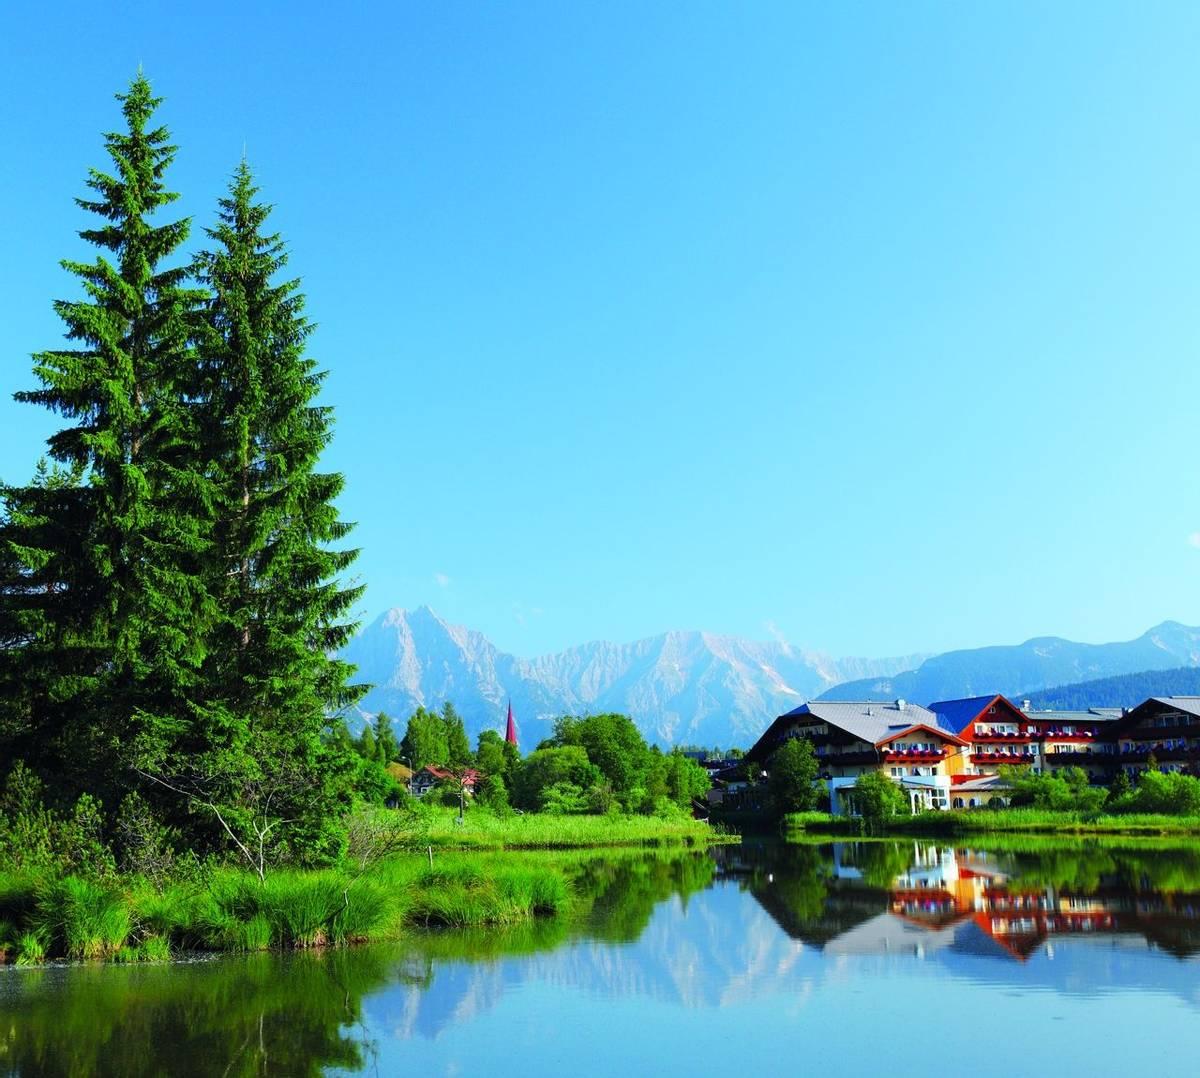 Austria - Weidach - Seefeld Plateau - shutterstock_148606829.jpg